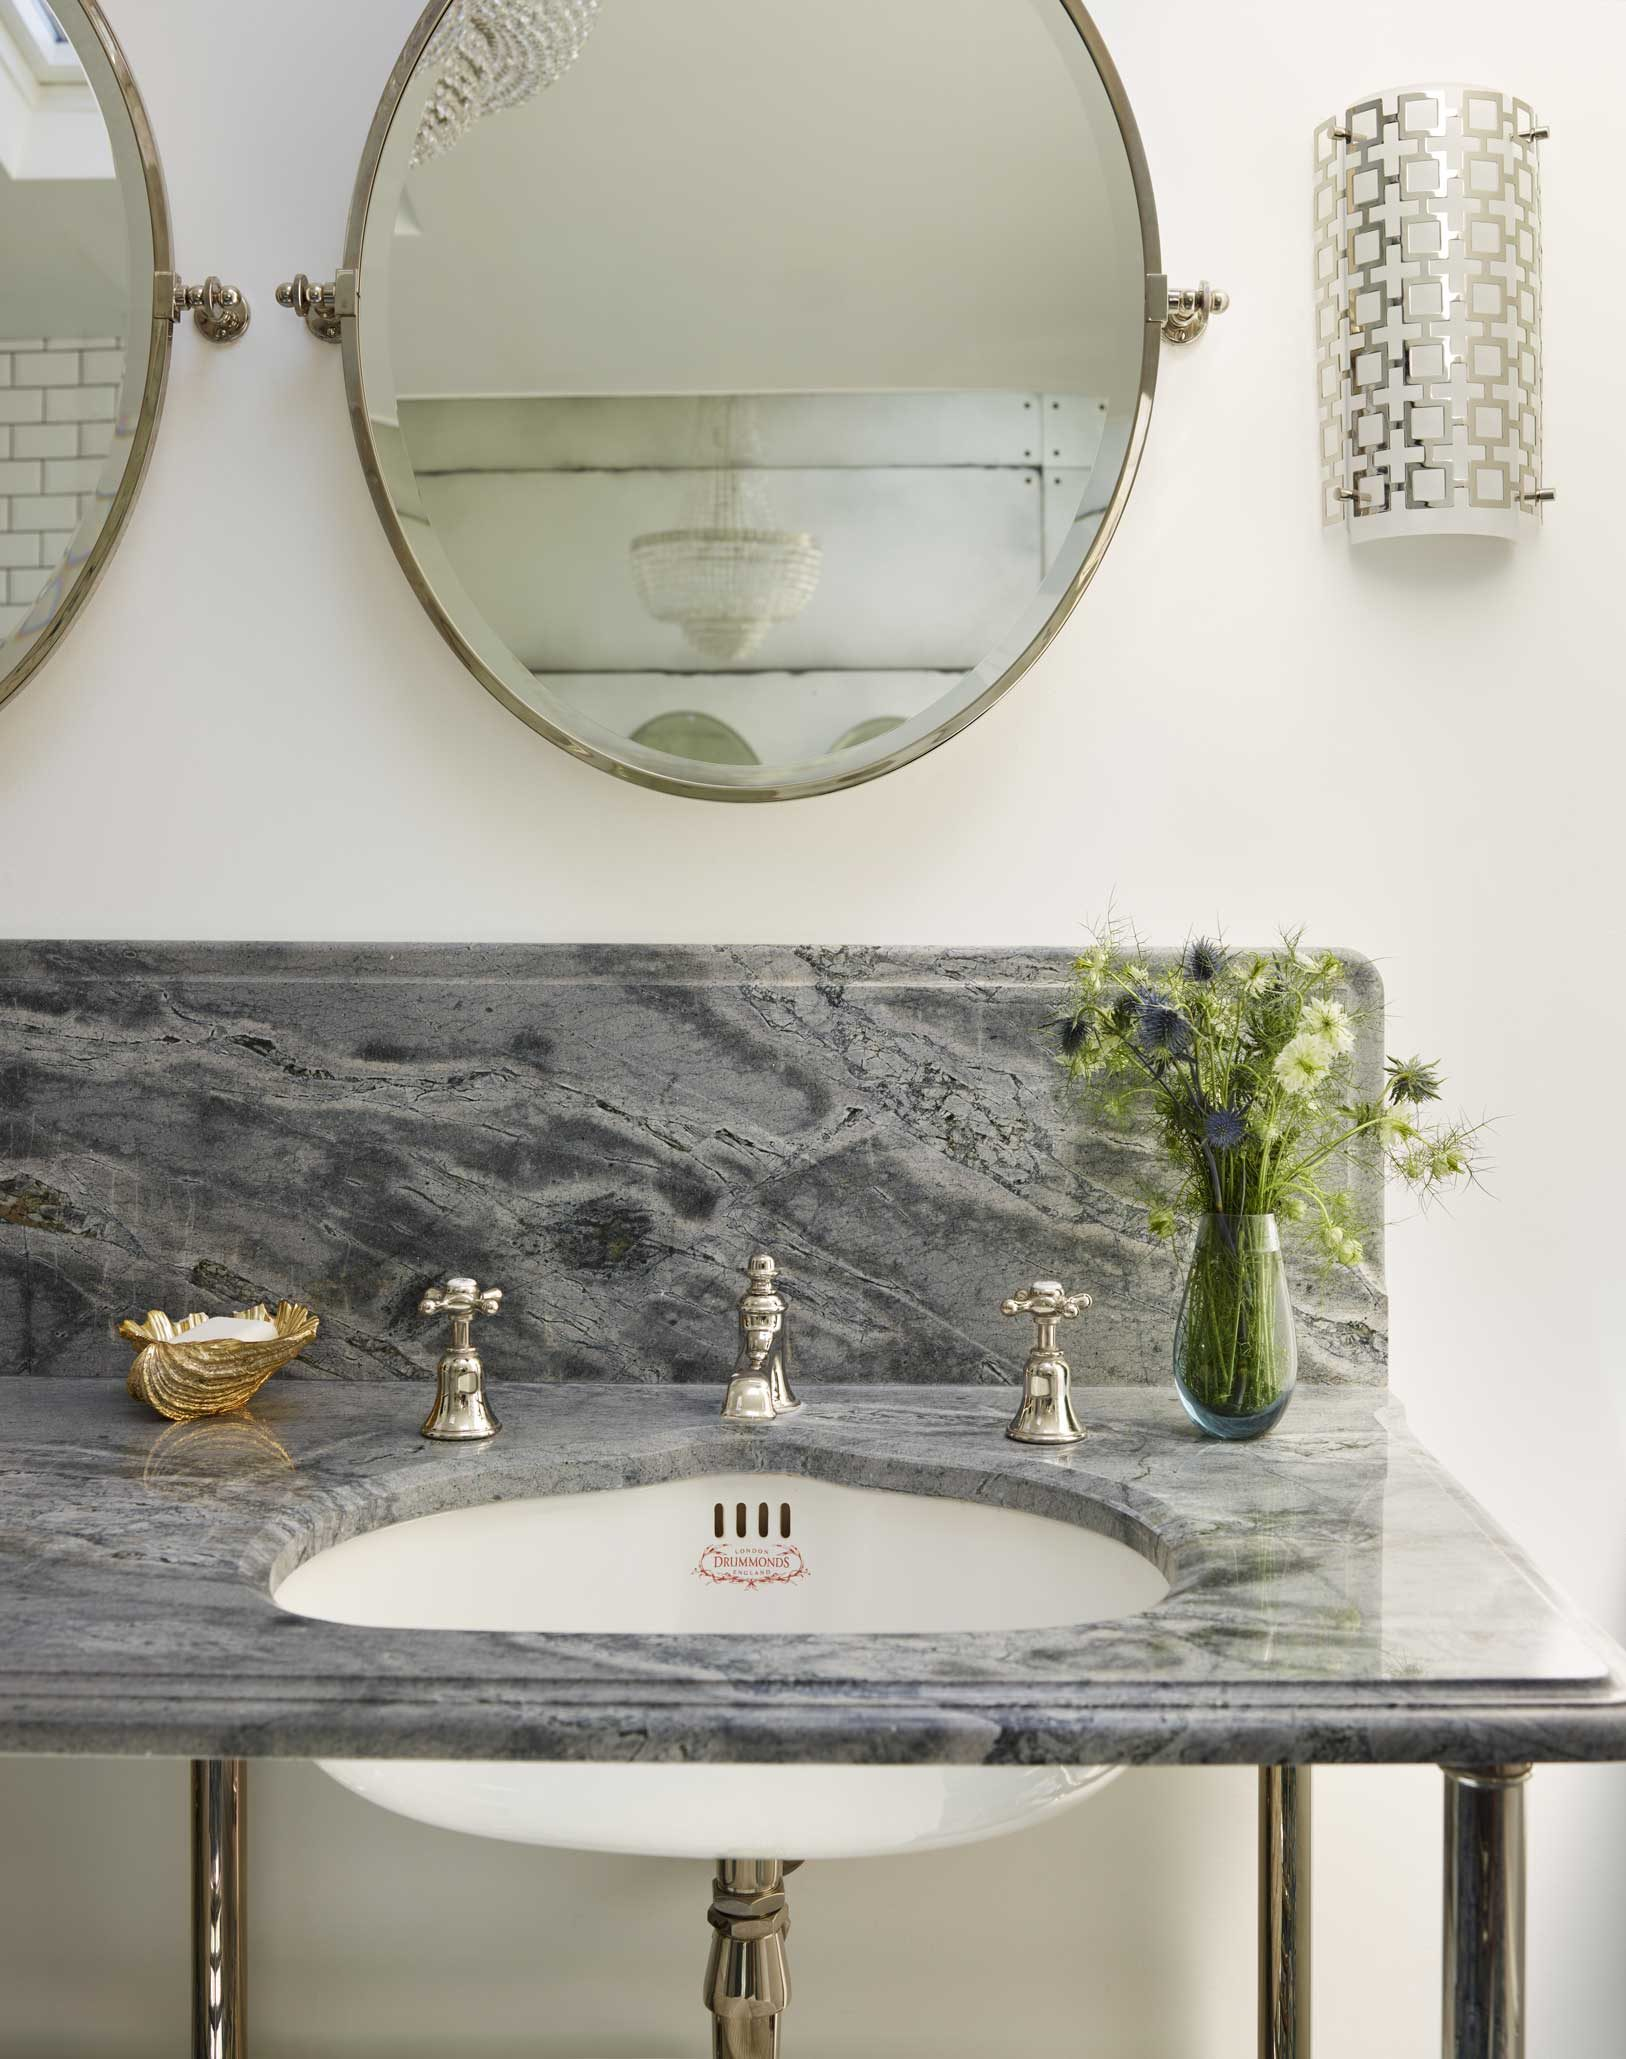 Luxury Wall Mounted Oval Bathroom Mirror Drummonds Bathrooms